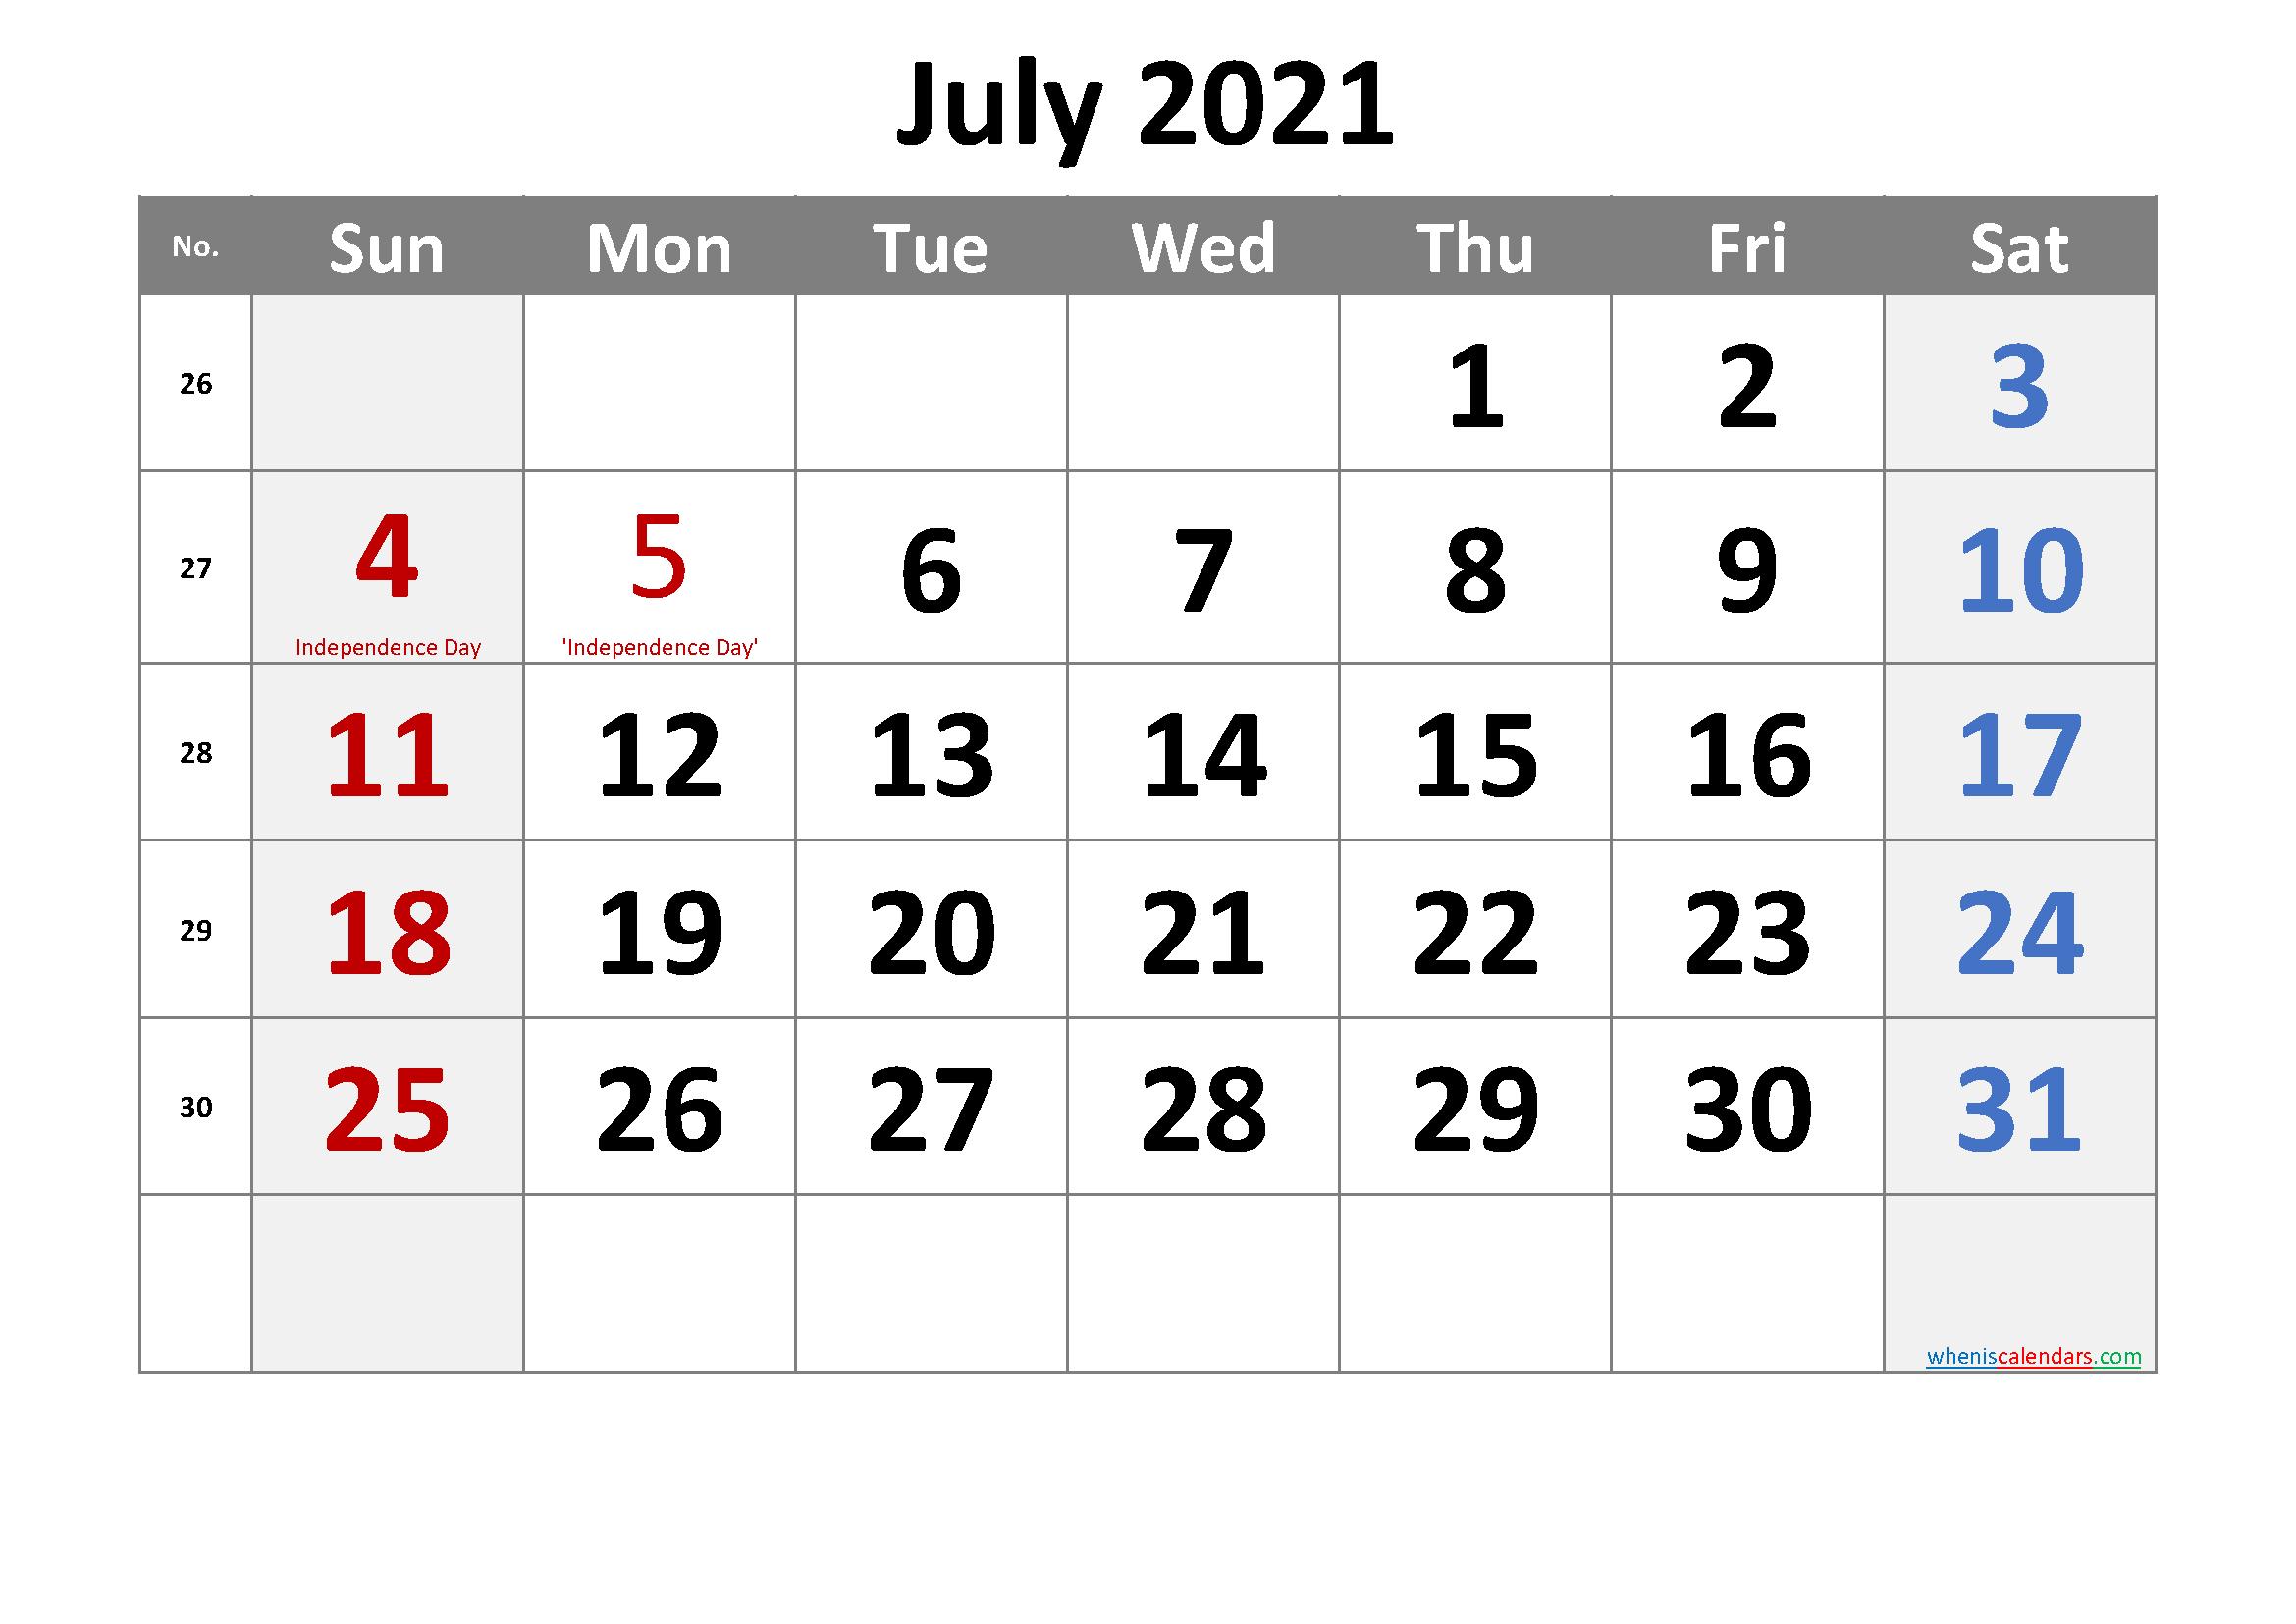 July 2021 Printable Calendar with Holidays